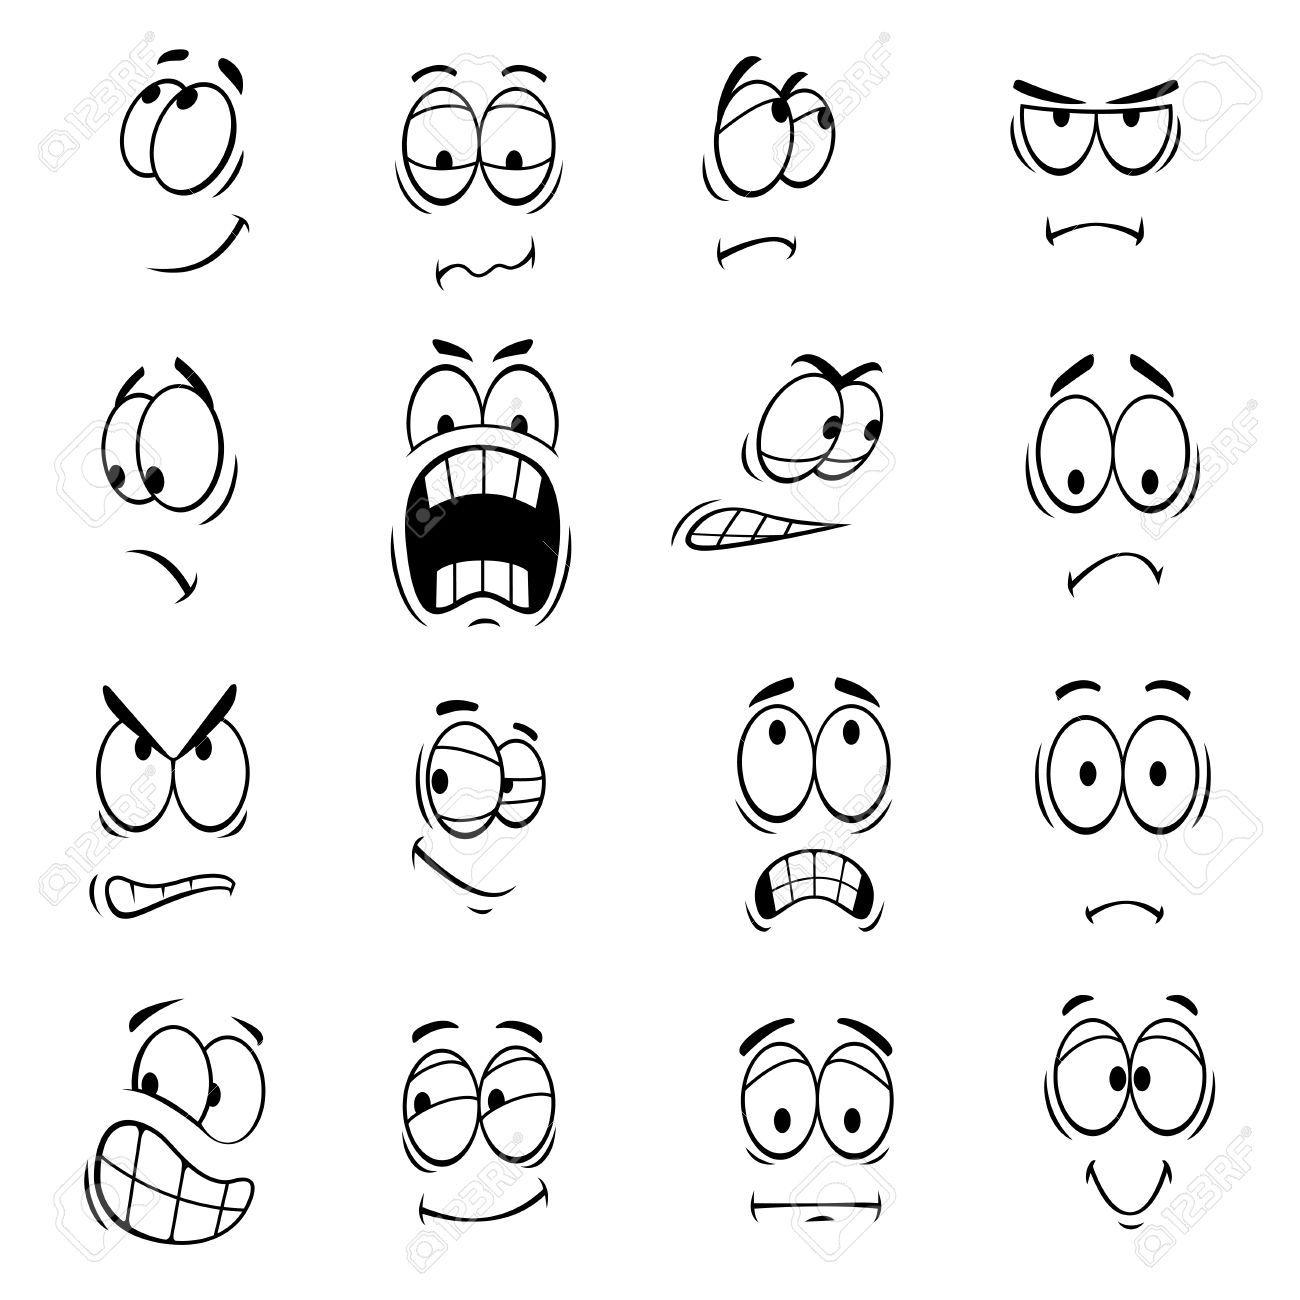 Related Image Yeux De Bande Dessinee Expression Visage Dessin D Humain